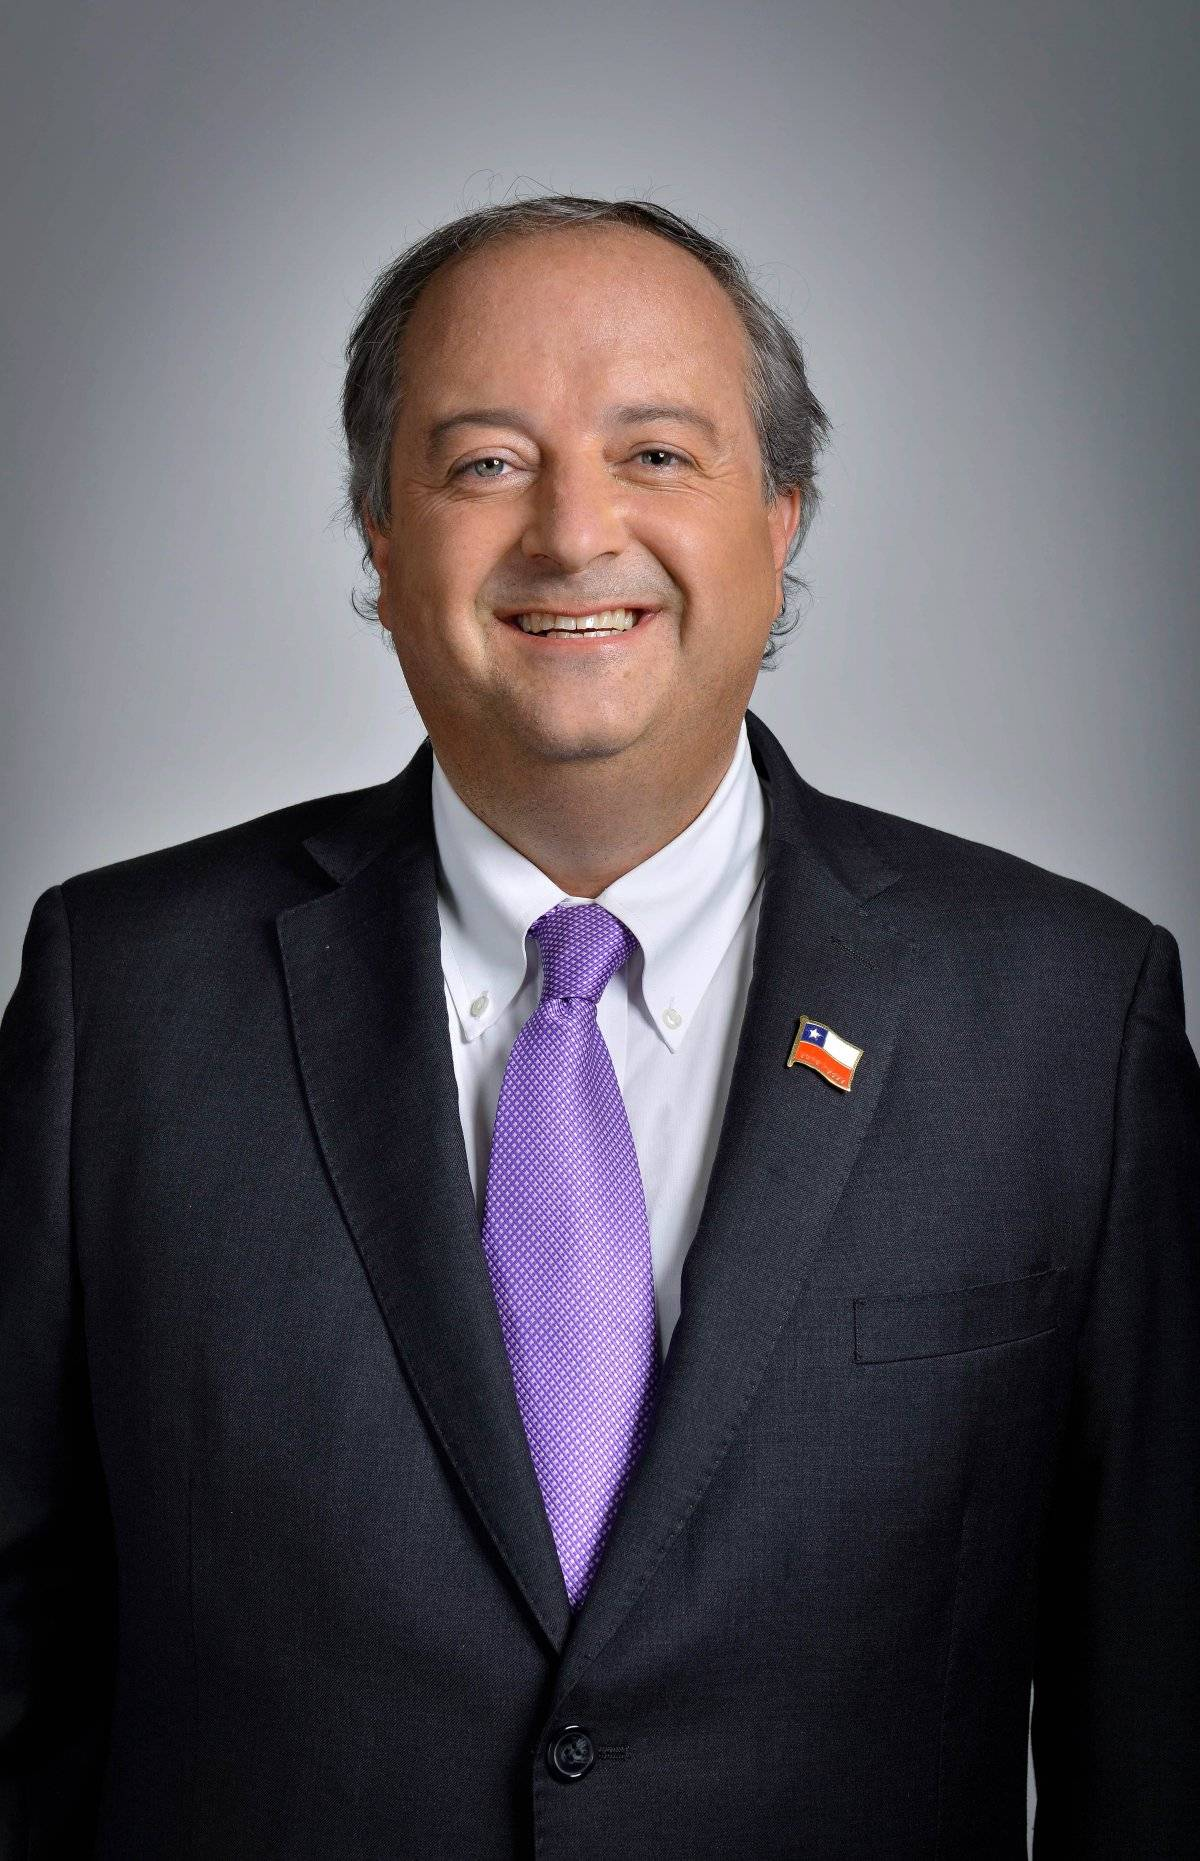 Nicolás Monckeberg Díaz